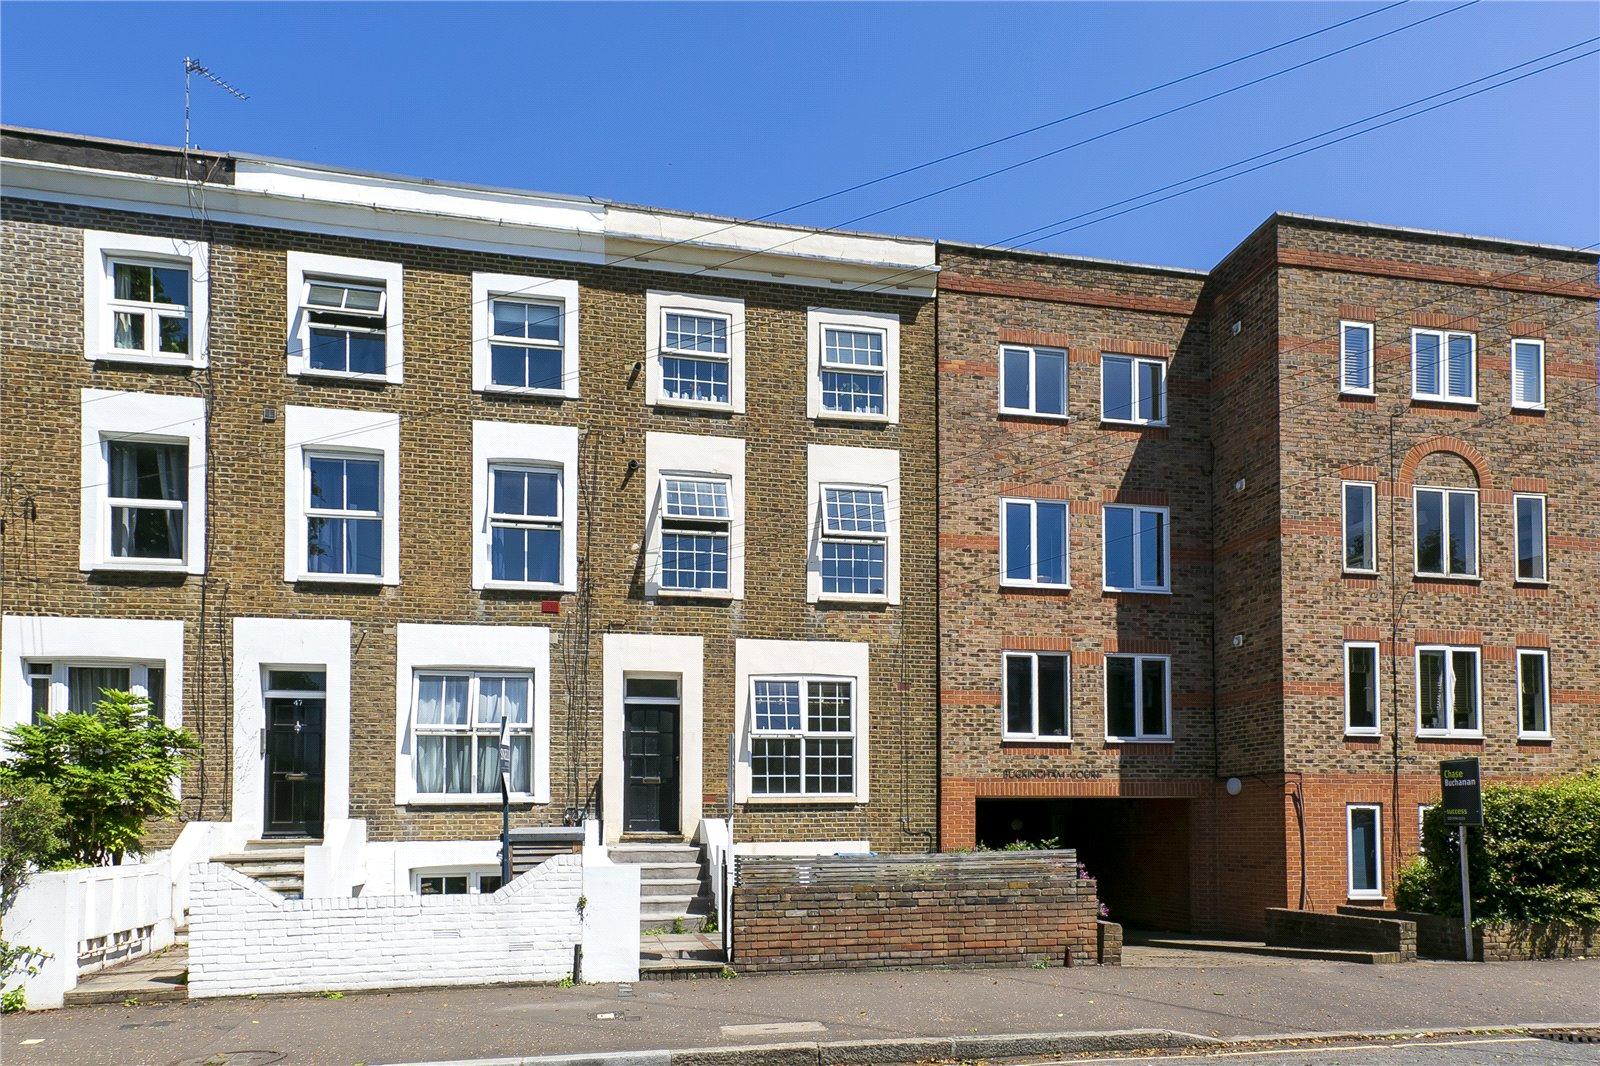 Arragon Road, Twickenham, TW1 3NG - Antony Roberts